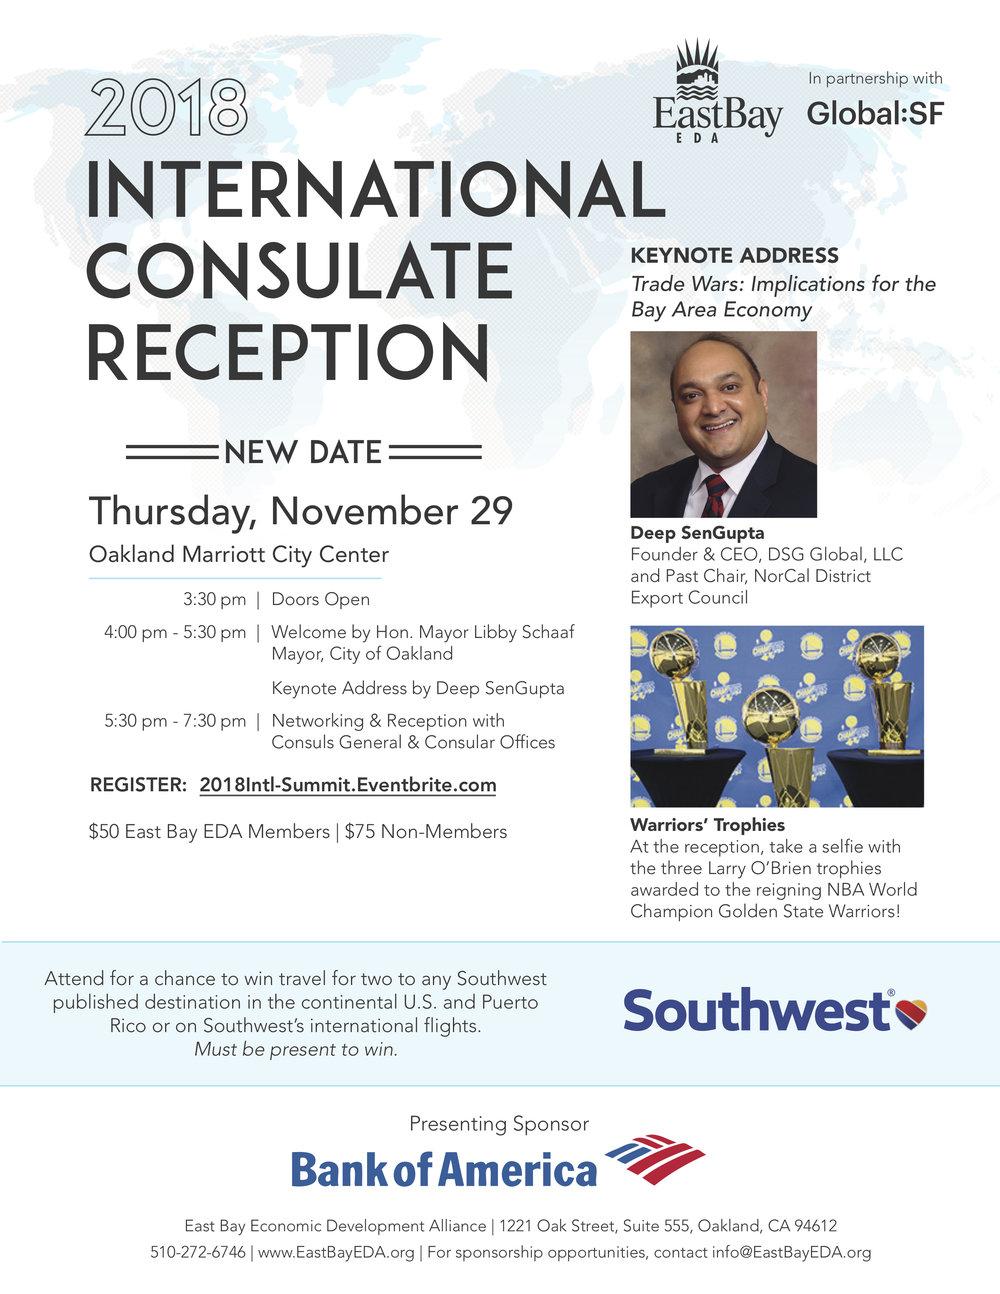 International Consulate Flyer FINAL w Trophy - New Date.jpg